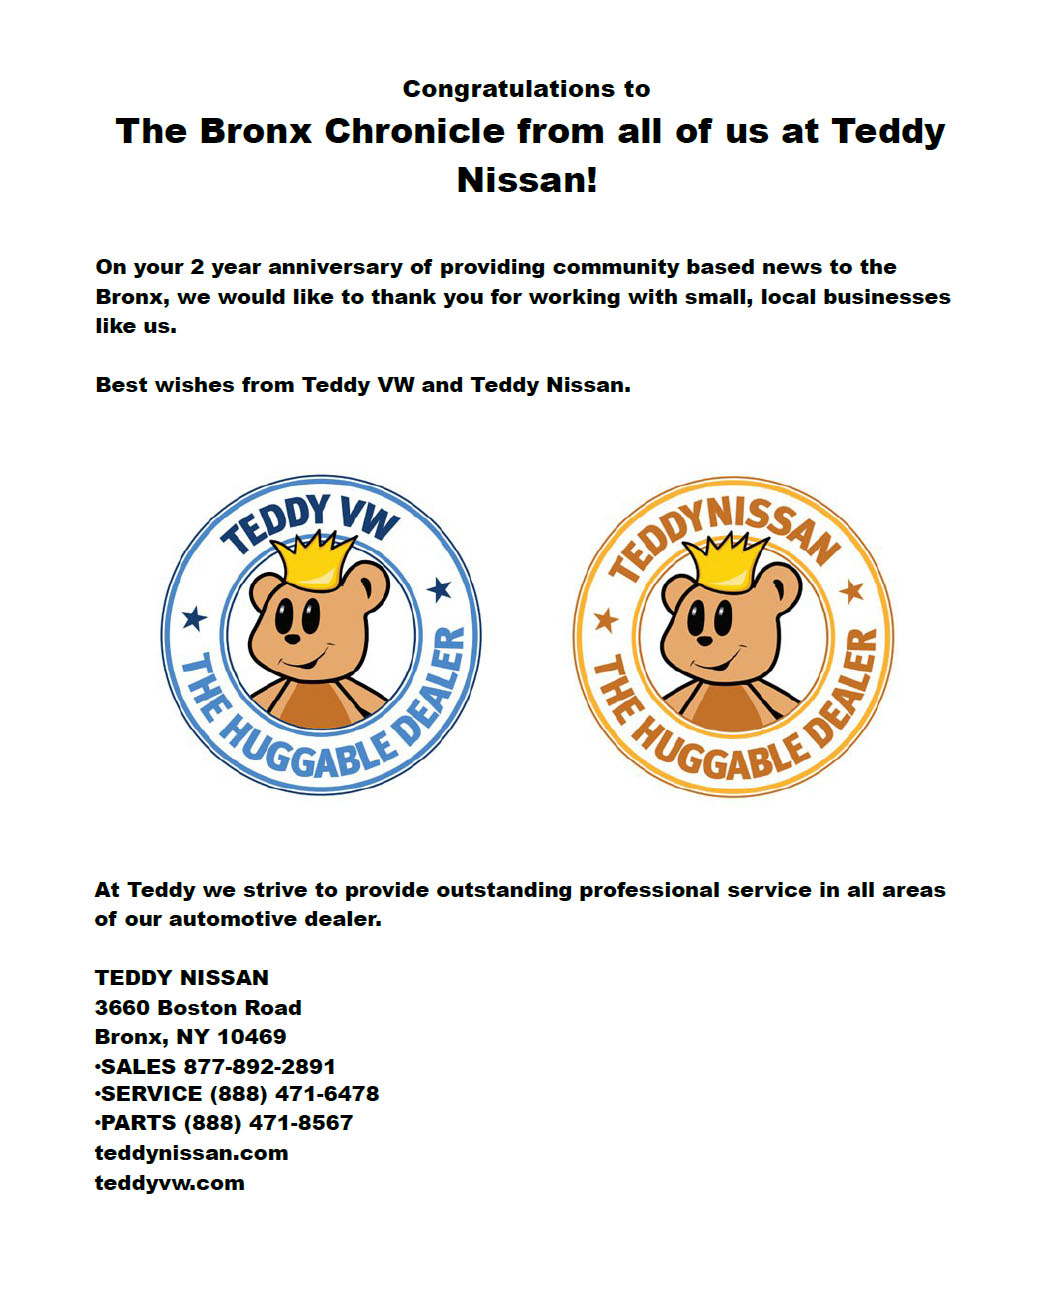 Congratulations Teddy Nissan - The Bronx Chronicle